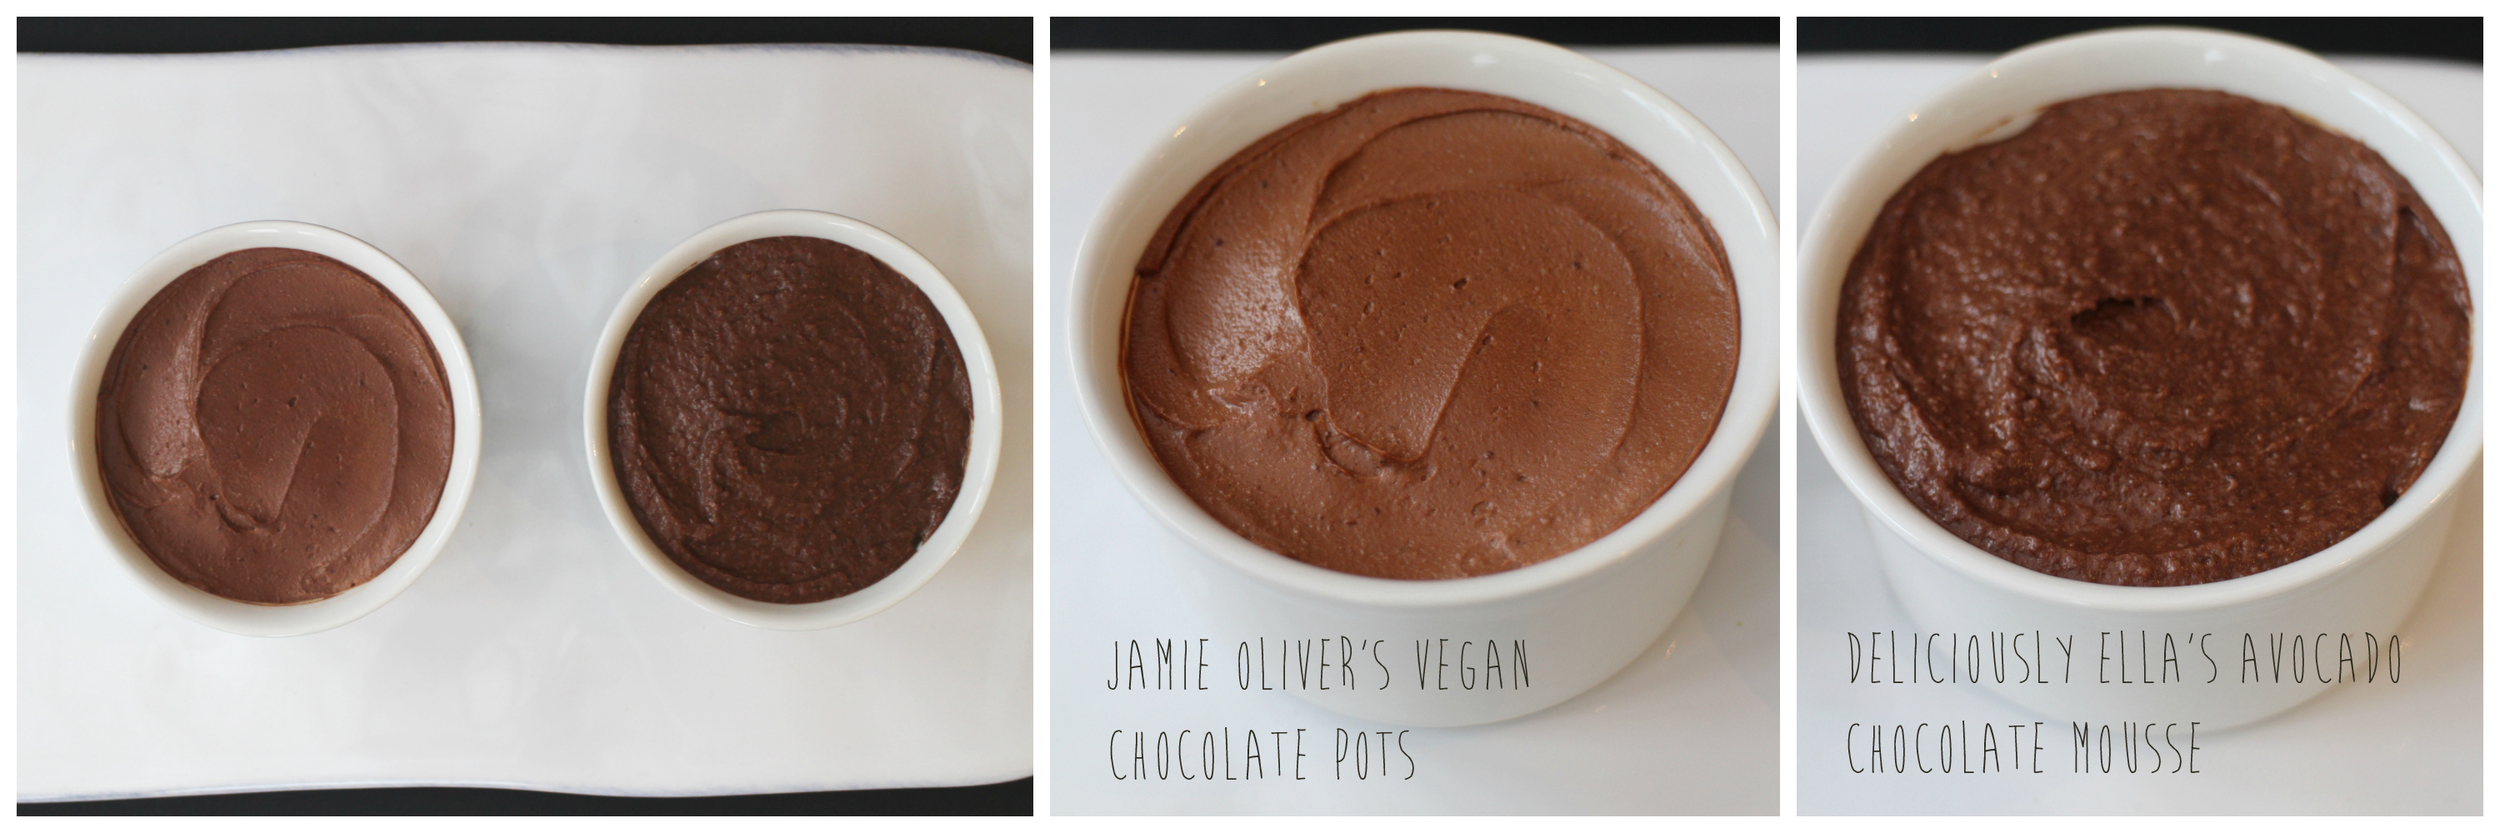 Vegan Chocolate Puds Serendipity Bakes